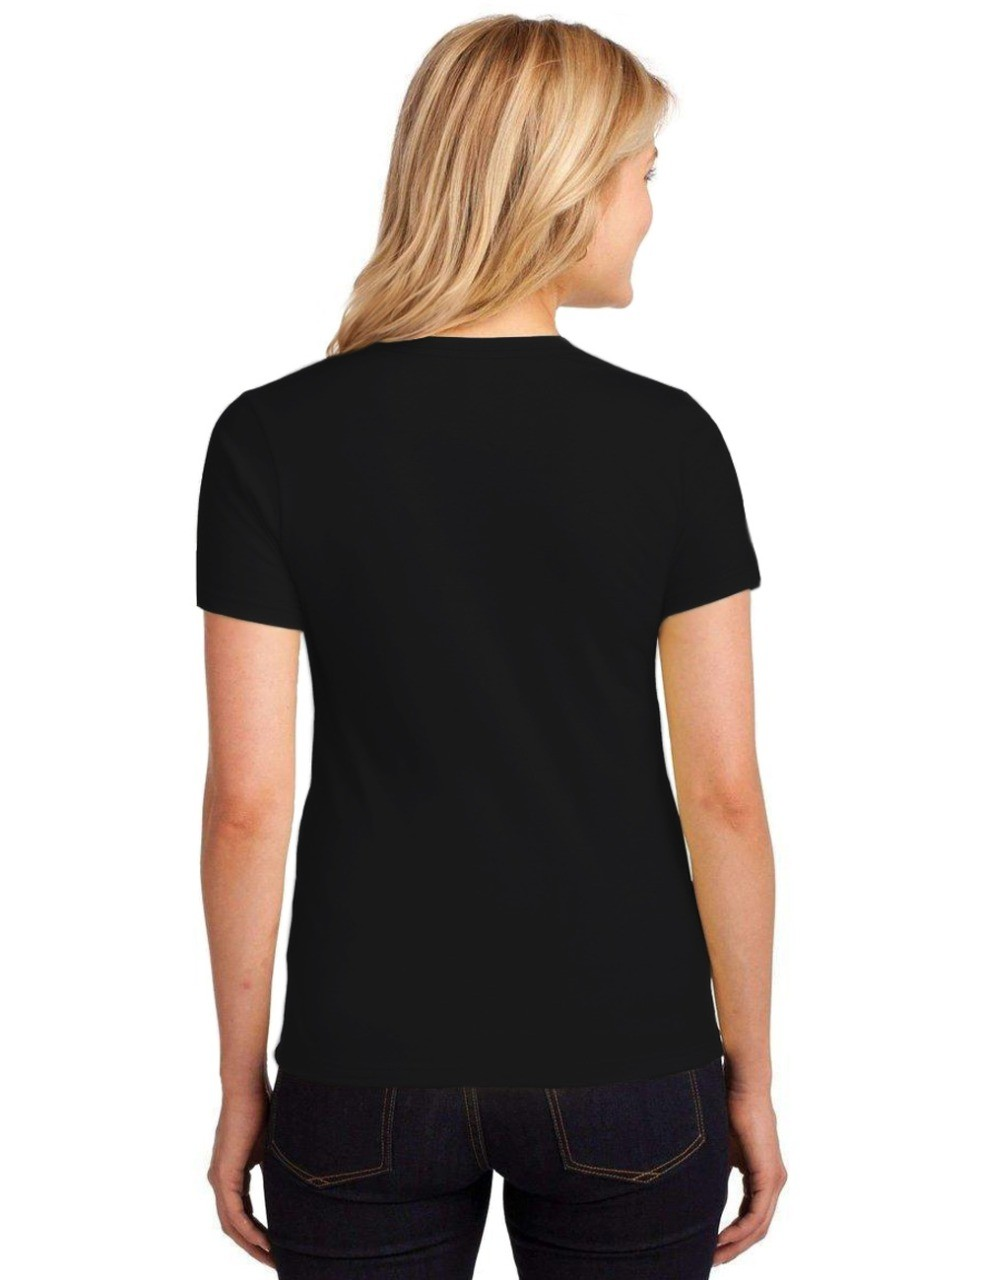 Camiseta Feminina T-Shirt Full Printed Marilyn Monroe Baby Look FP_019